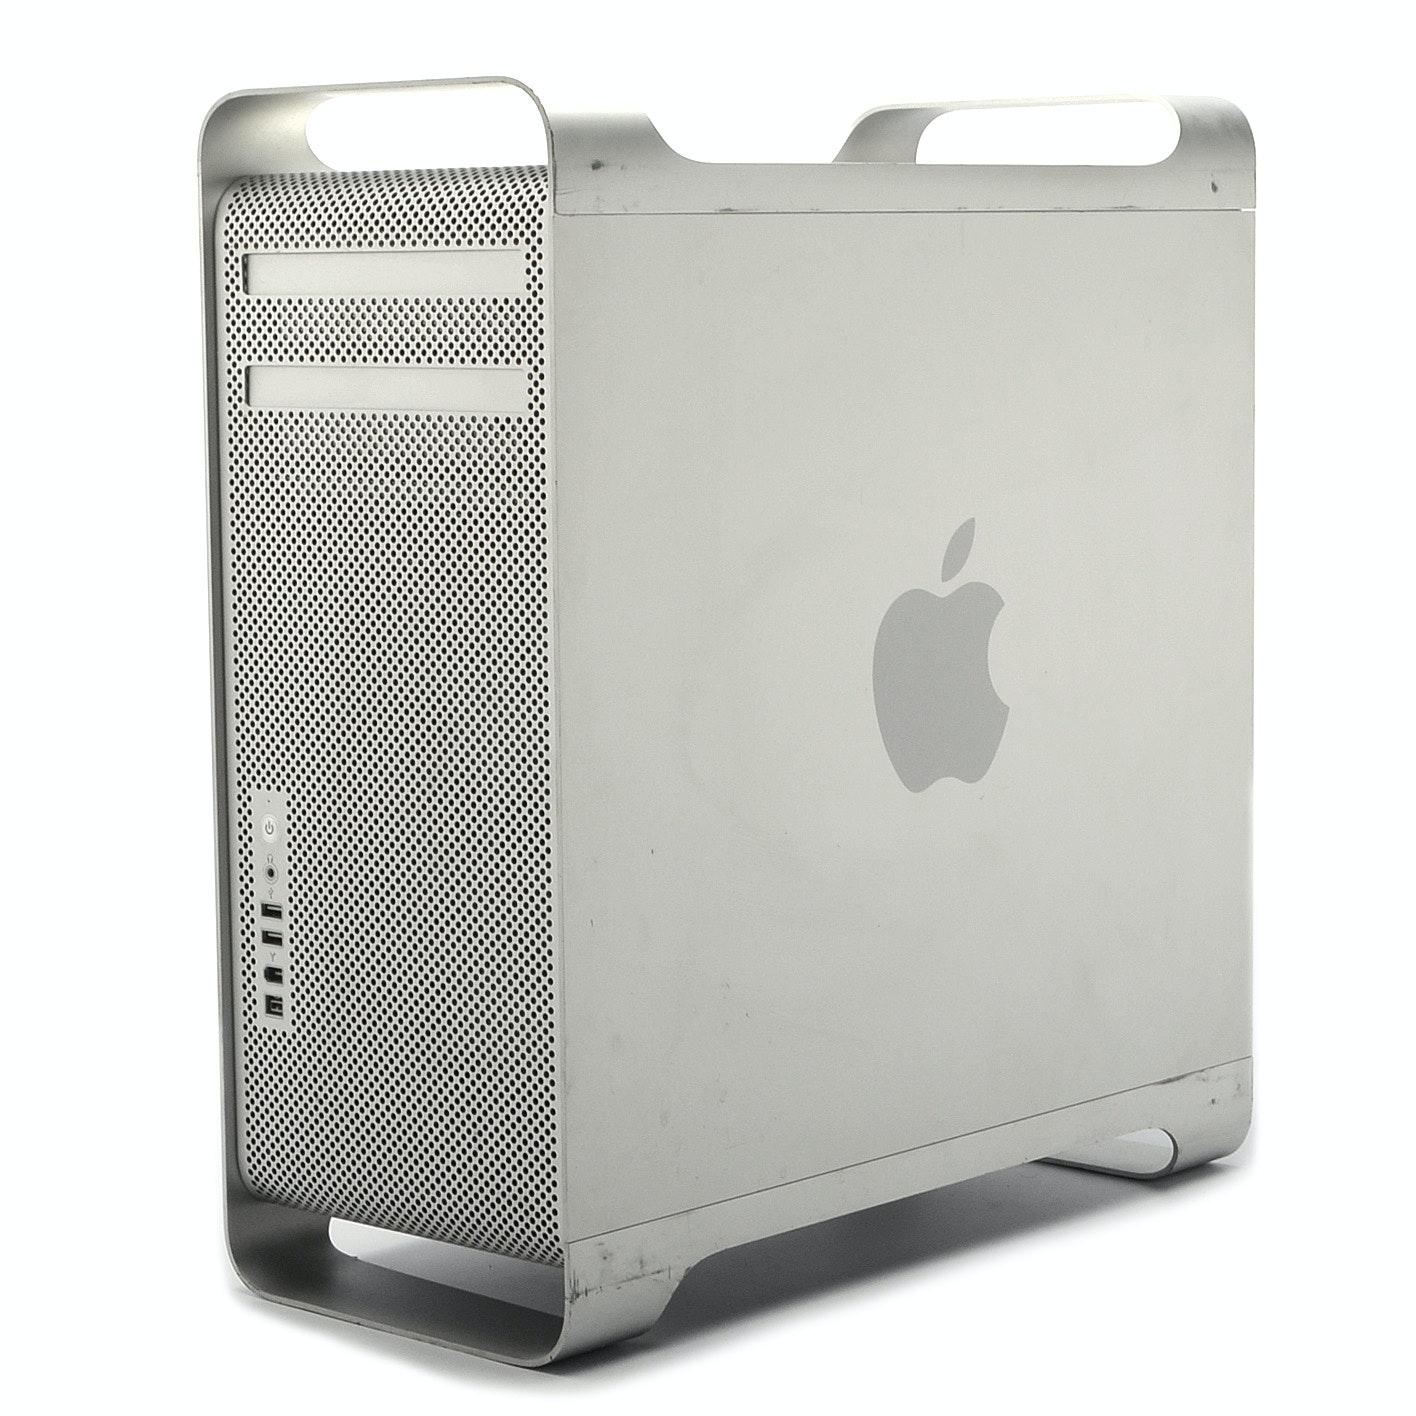 Mac Pro Desktop Tower